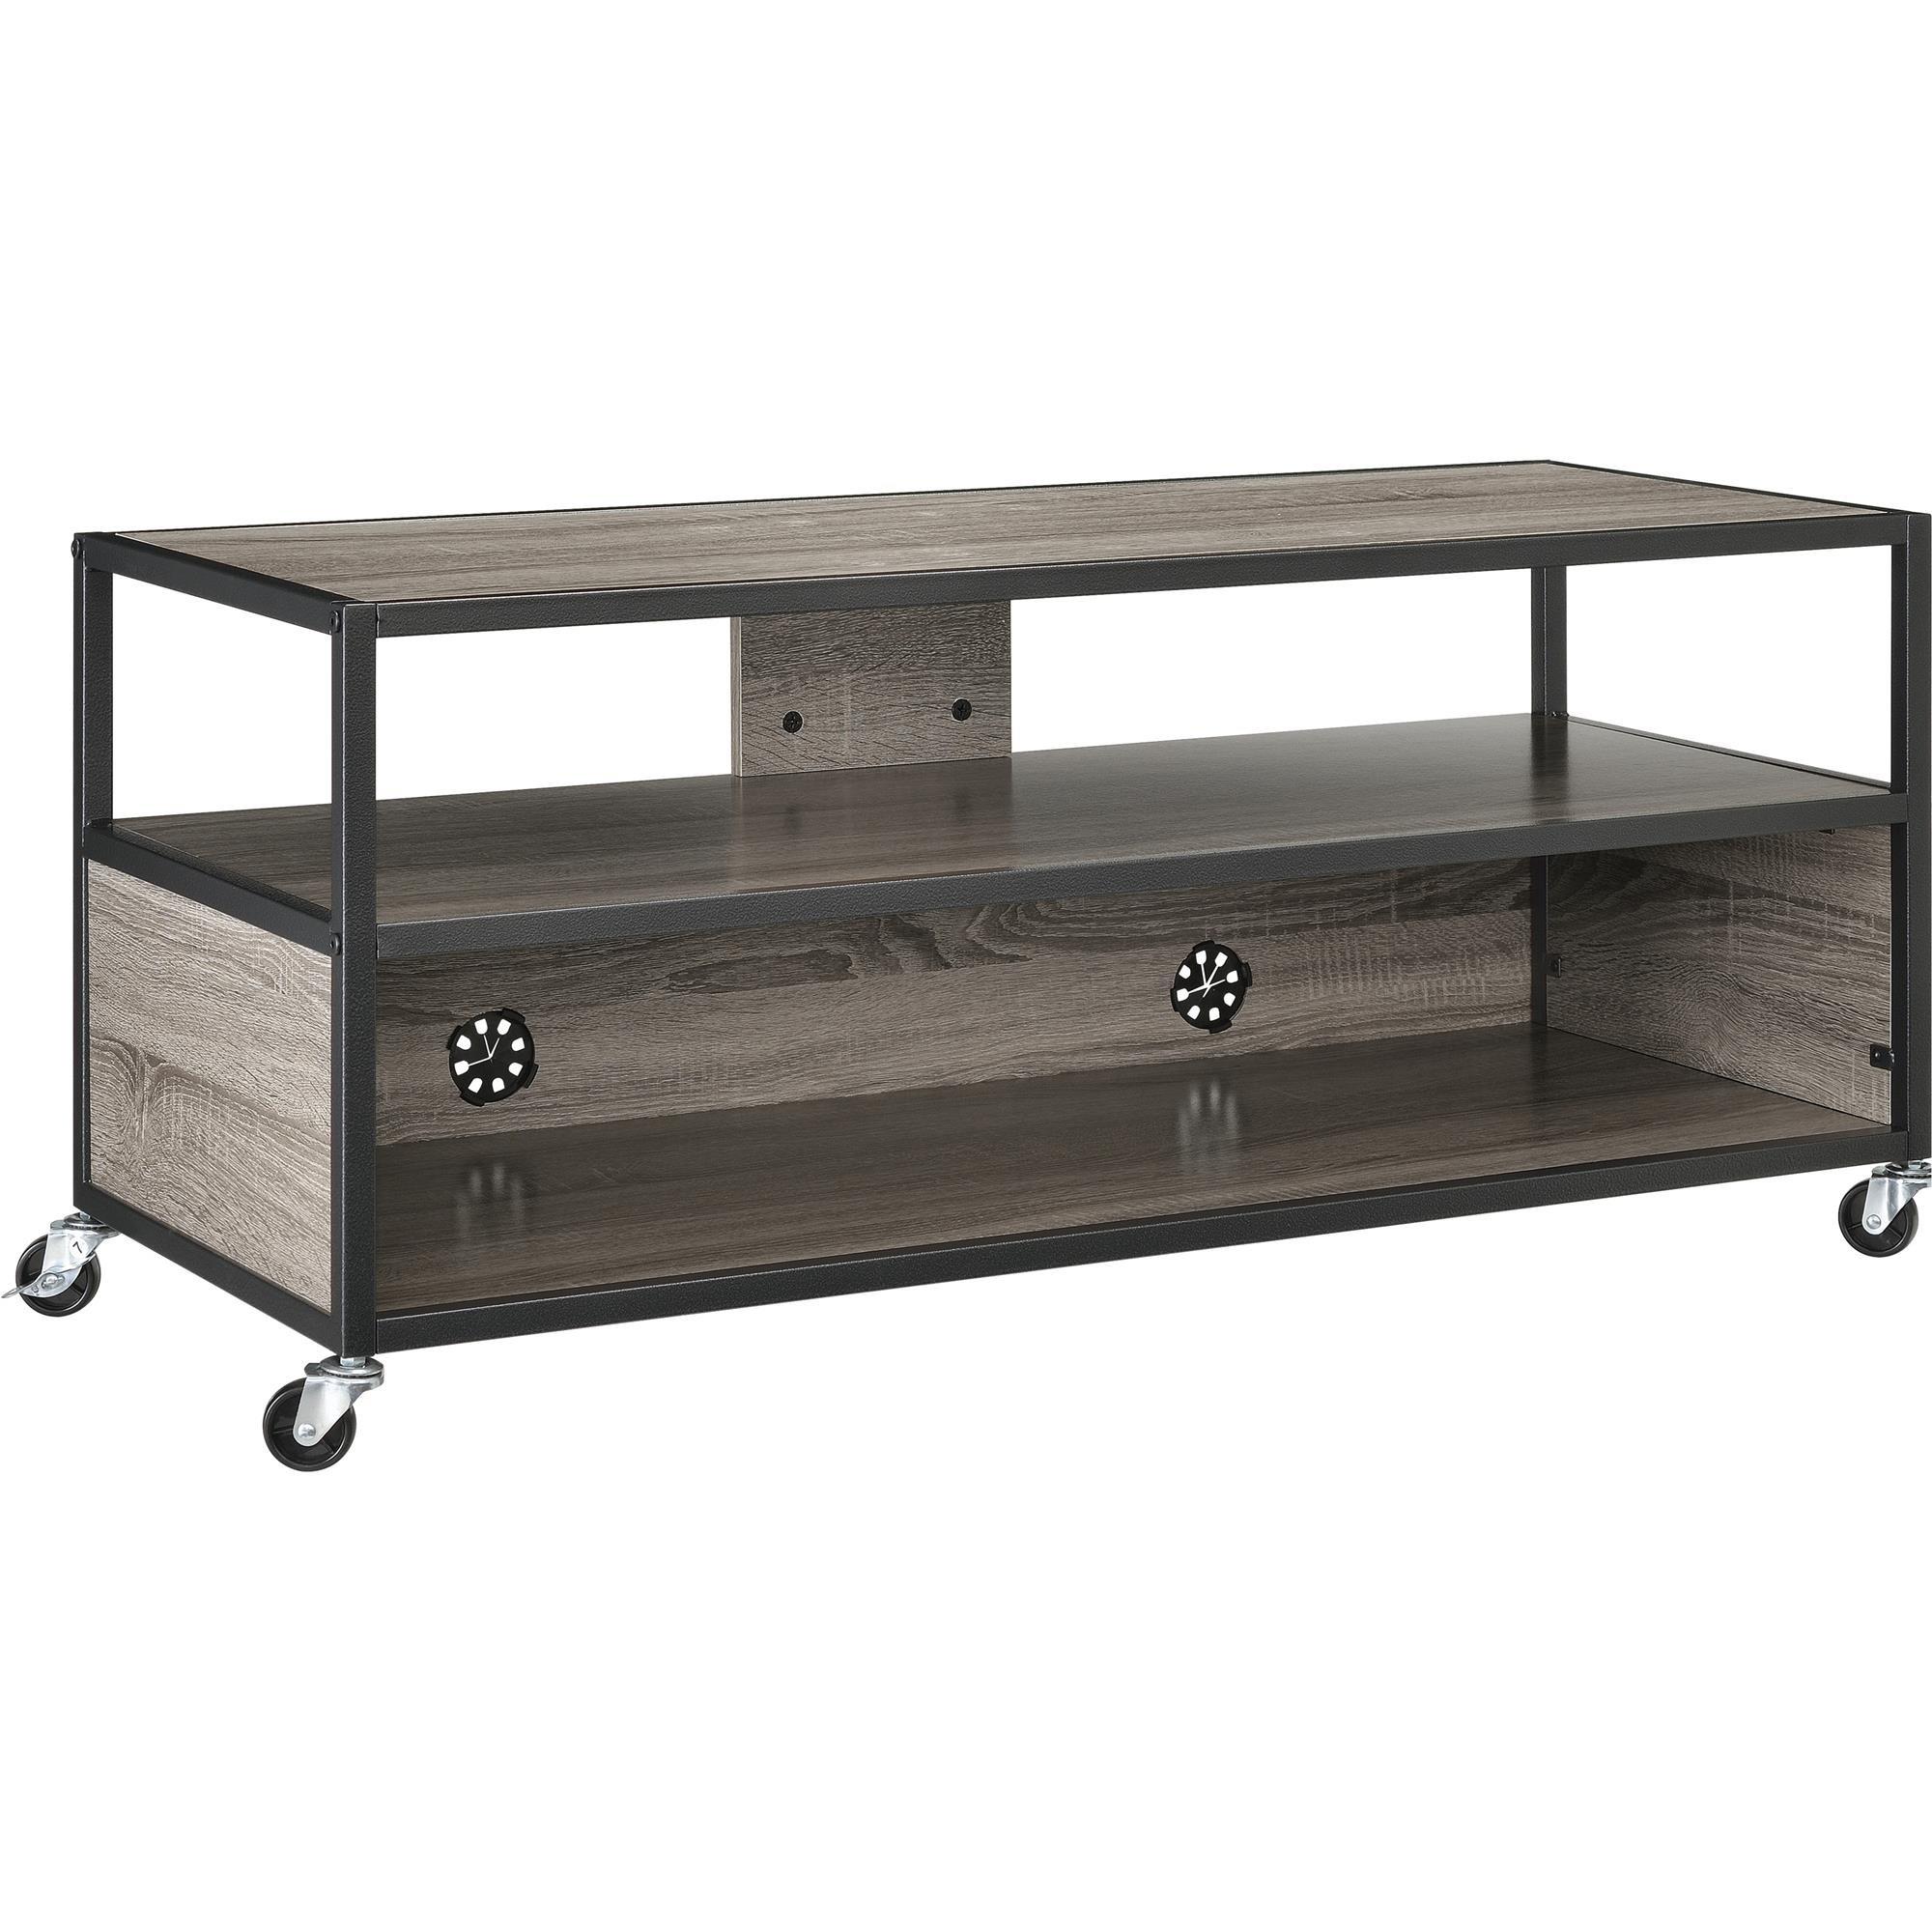 Altra Mason Ridge Mobile 46'' TV Stand with Metal Frame, Sonoma Oak/Black by Altra Furniture (Image #2)